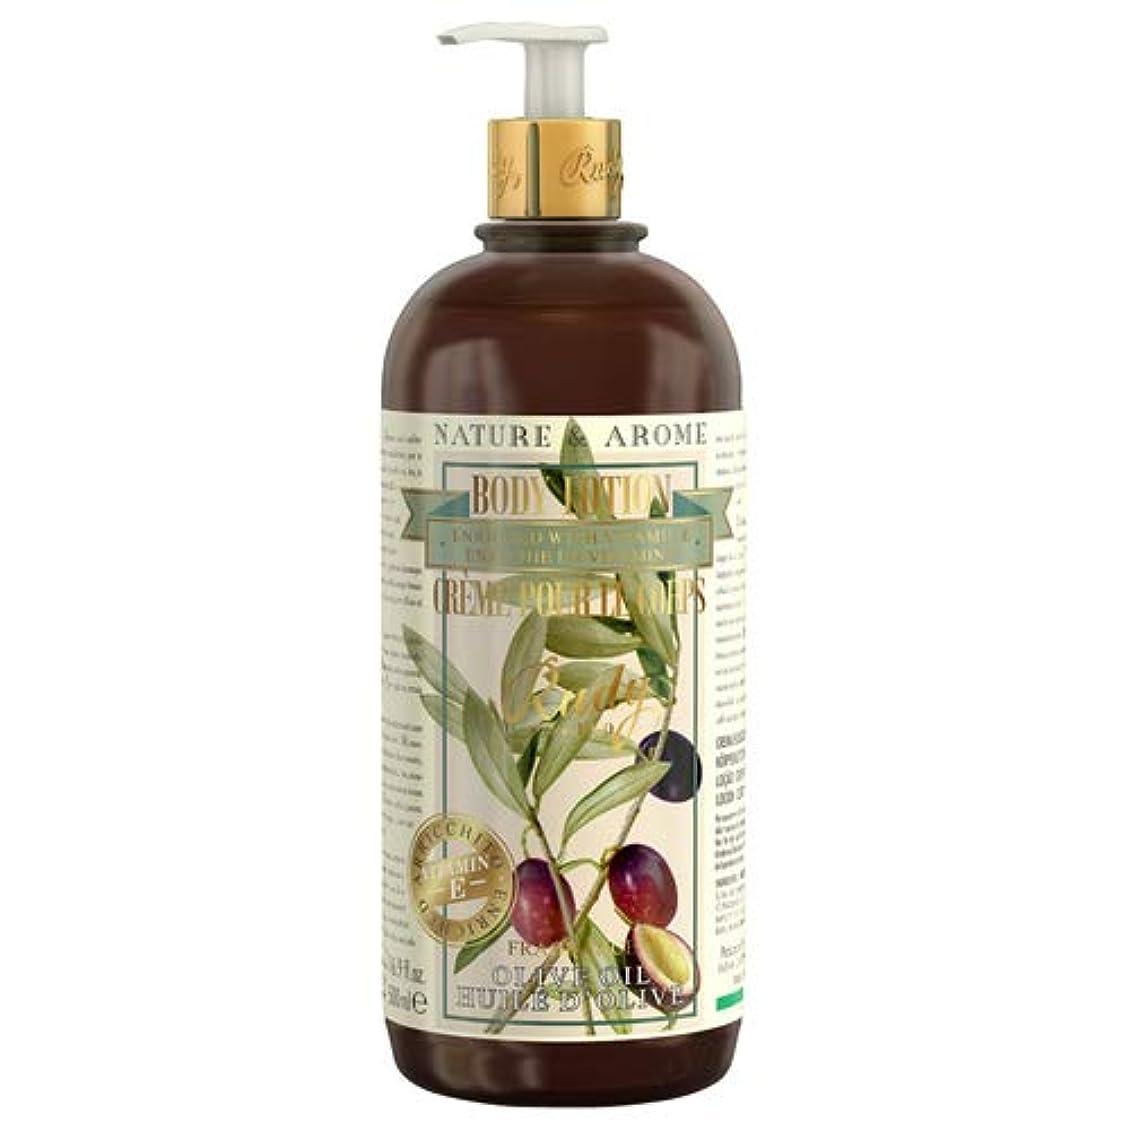 RUDY Nature&Arome Apothecary ネイチャーアロマ アポセカリー Body Lotion ボディローション Olive Oil オリーブオイル